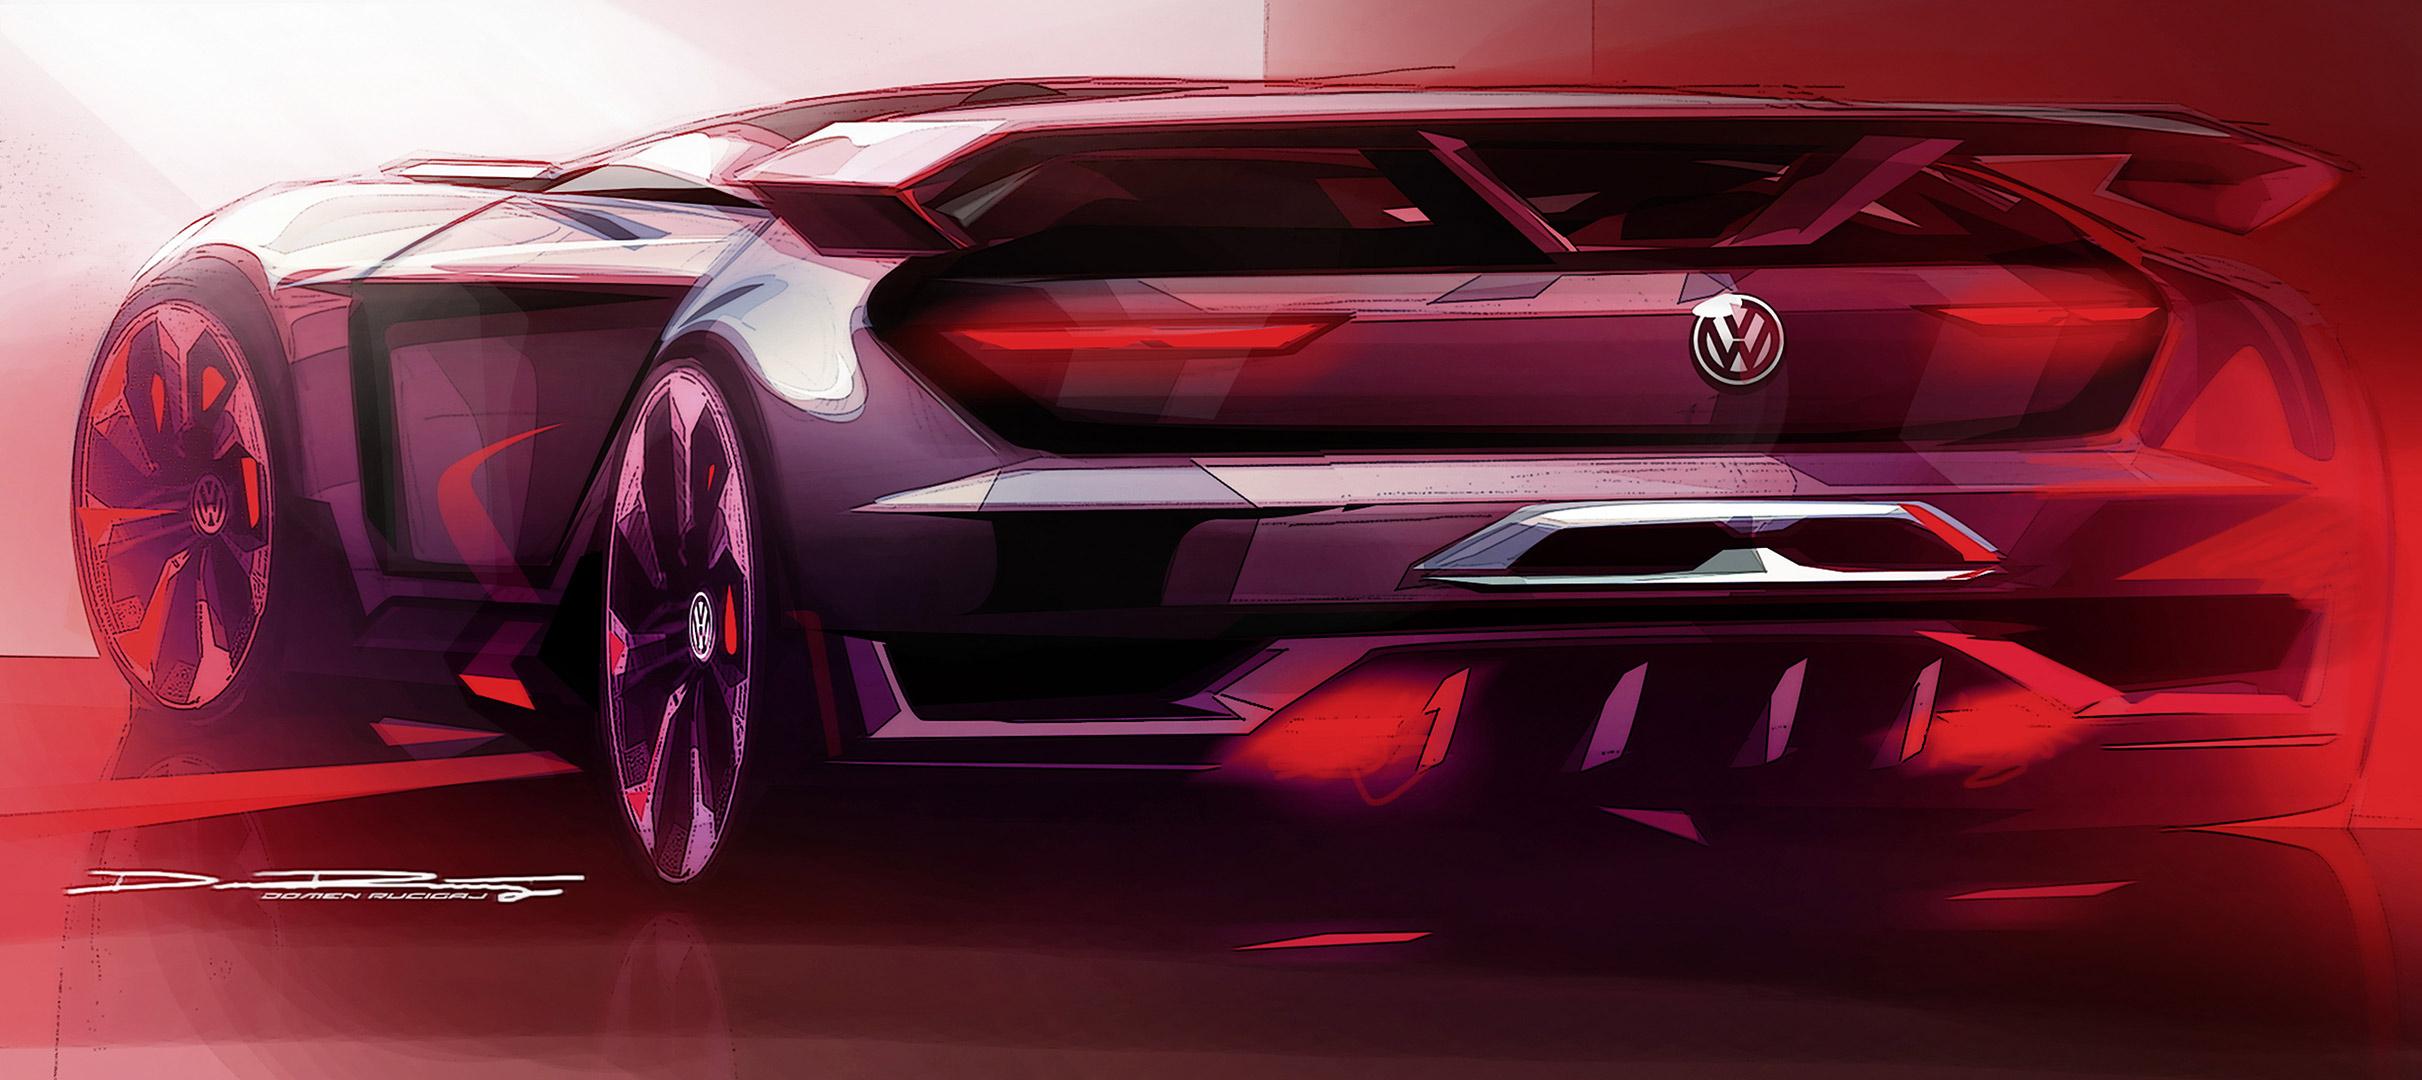 volkswagen-design-vision-gti-gran-turismo-002